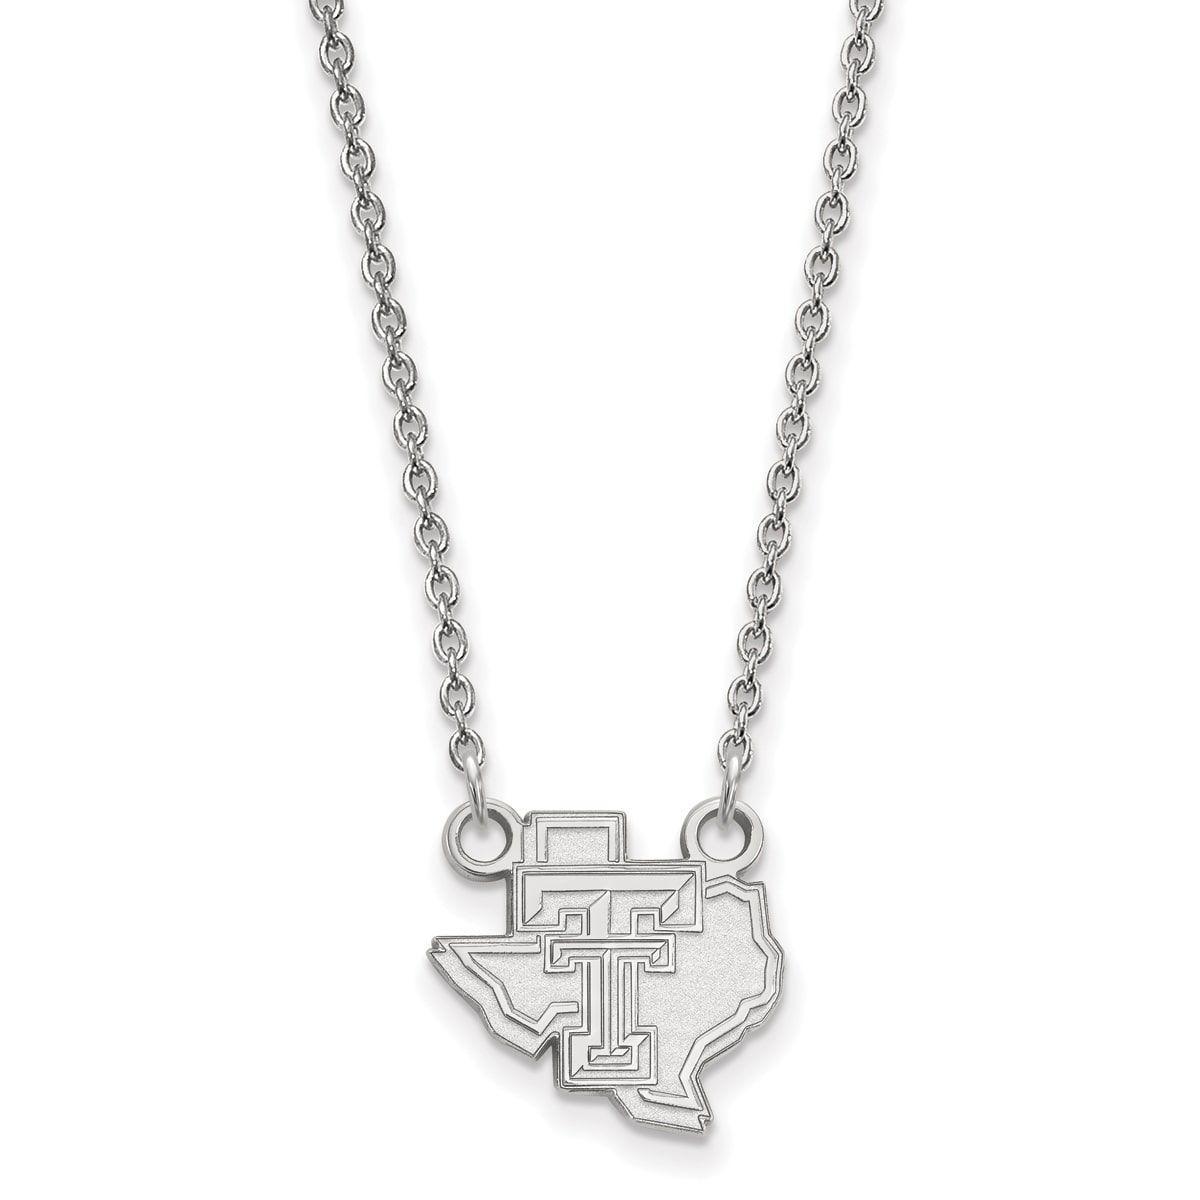 14kw LogoArt Texas Tech University Small Pendant with Necklace